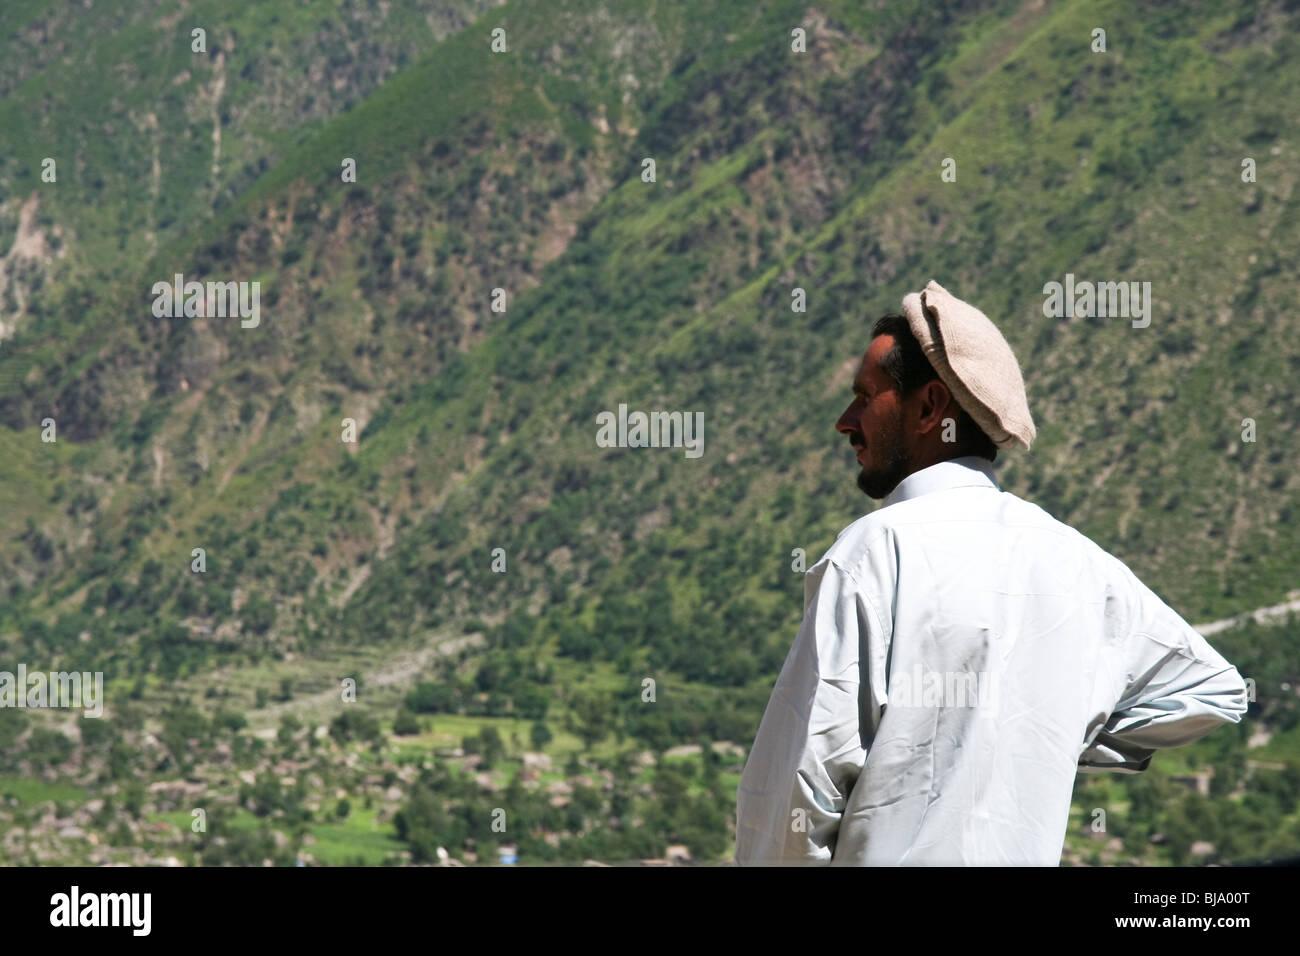 Gilgit-Baltistan Karakoram Highway Pakistan Men - Stock Image